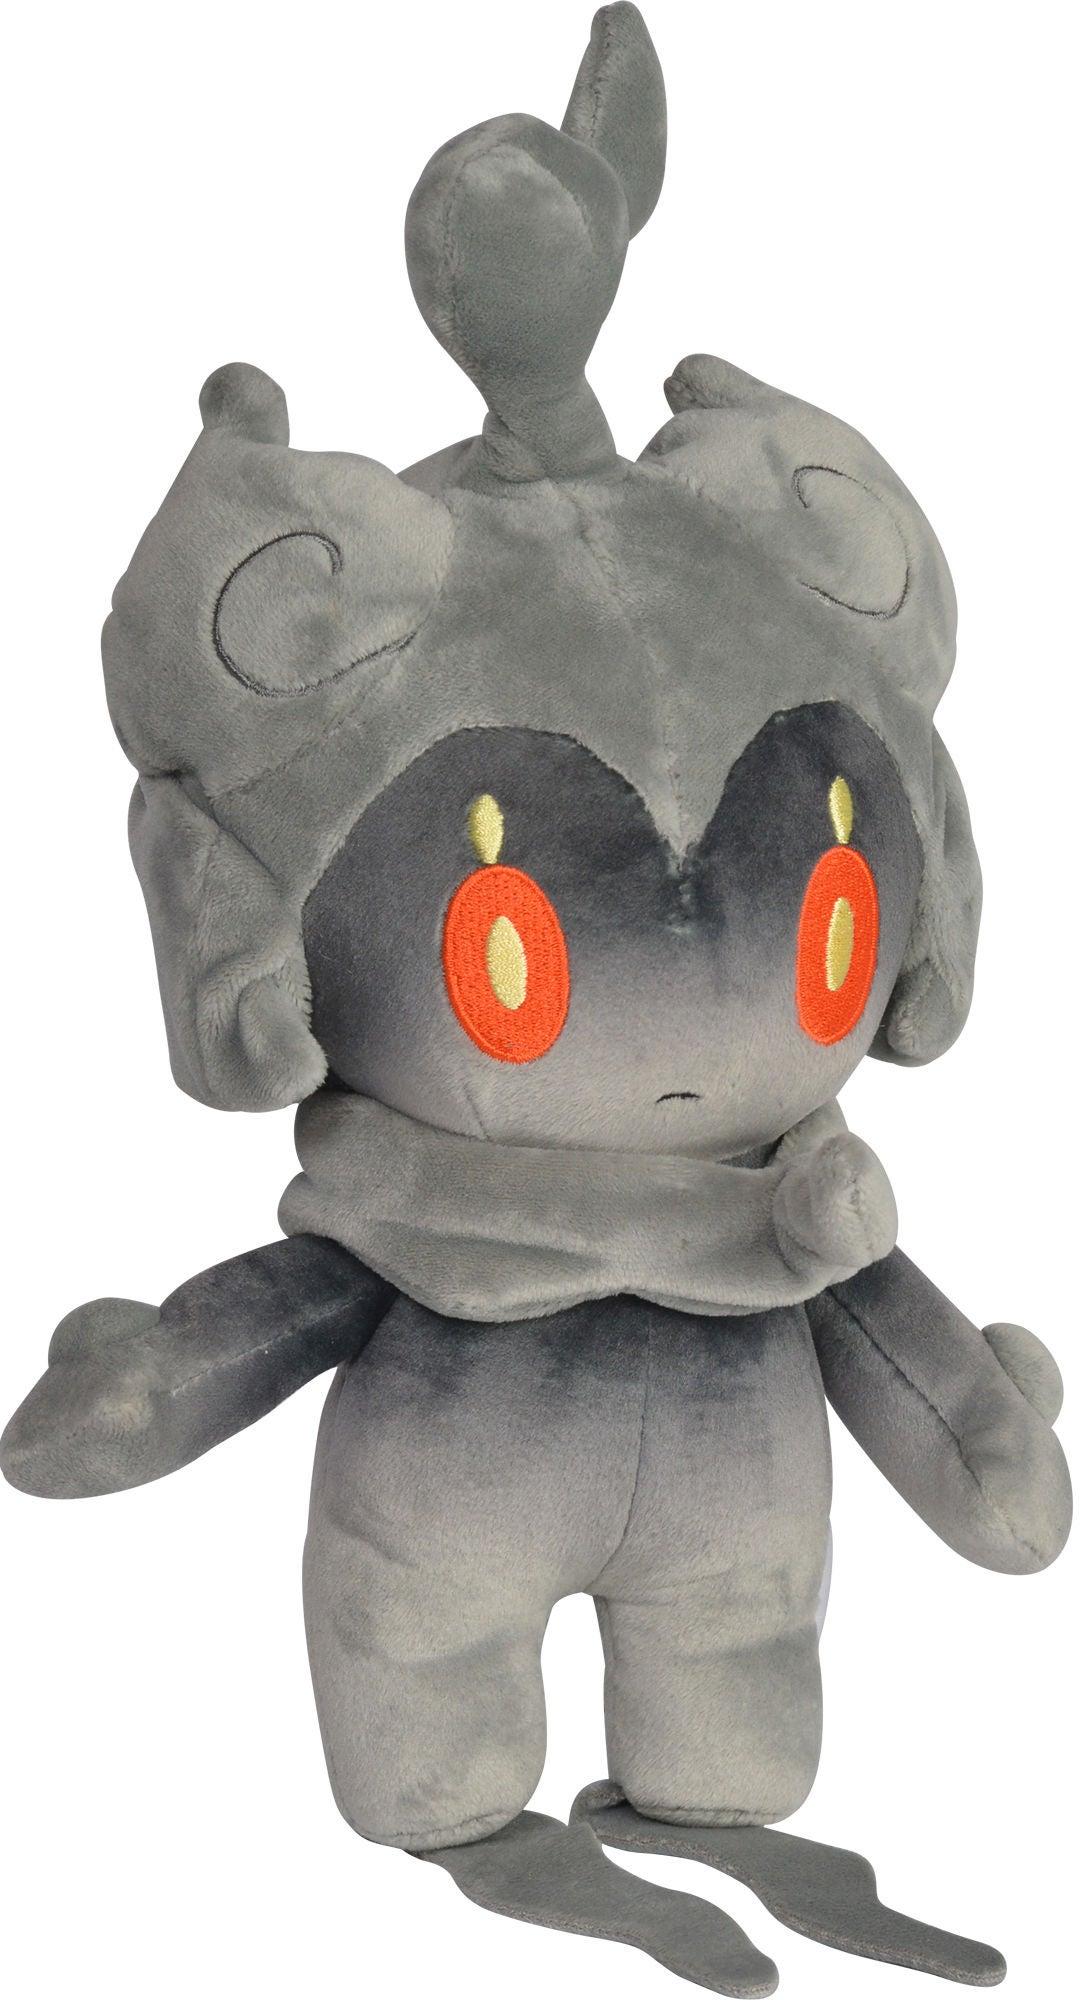 Pokémon Kosedyr Plysj Marshadow